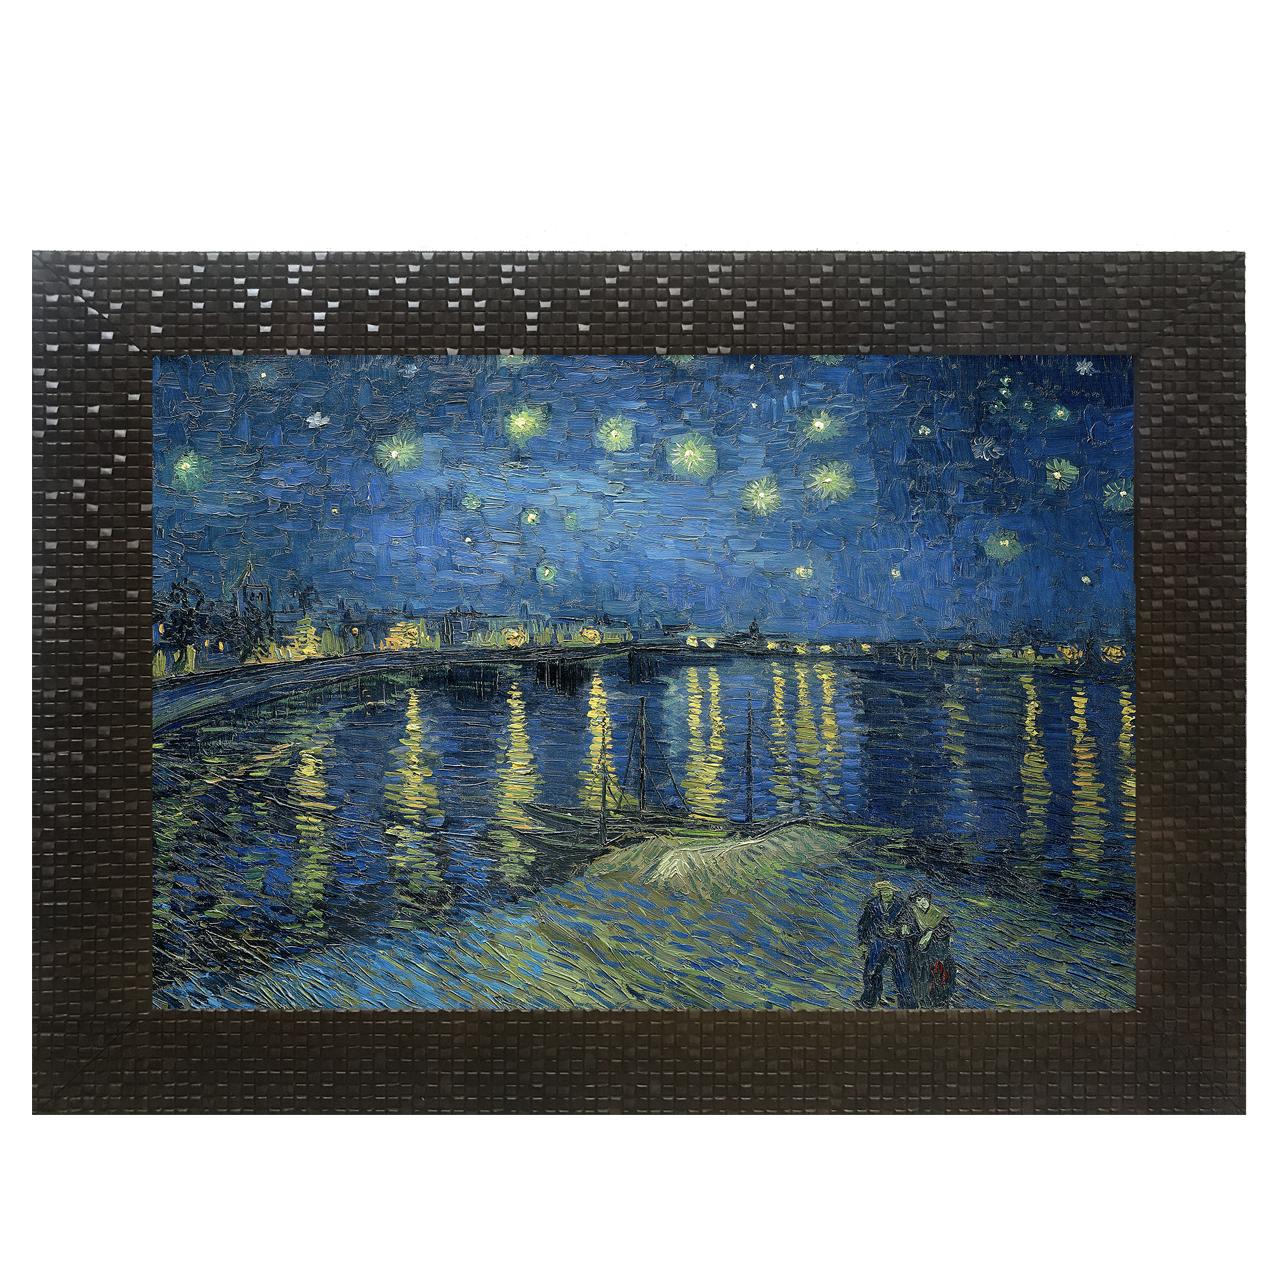 تابلو چاپ سی طرح شب پر ستاره بر فراز رن کد KL042